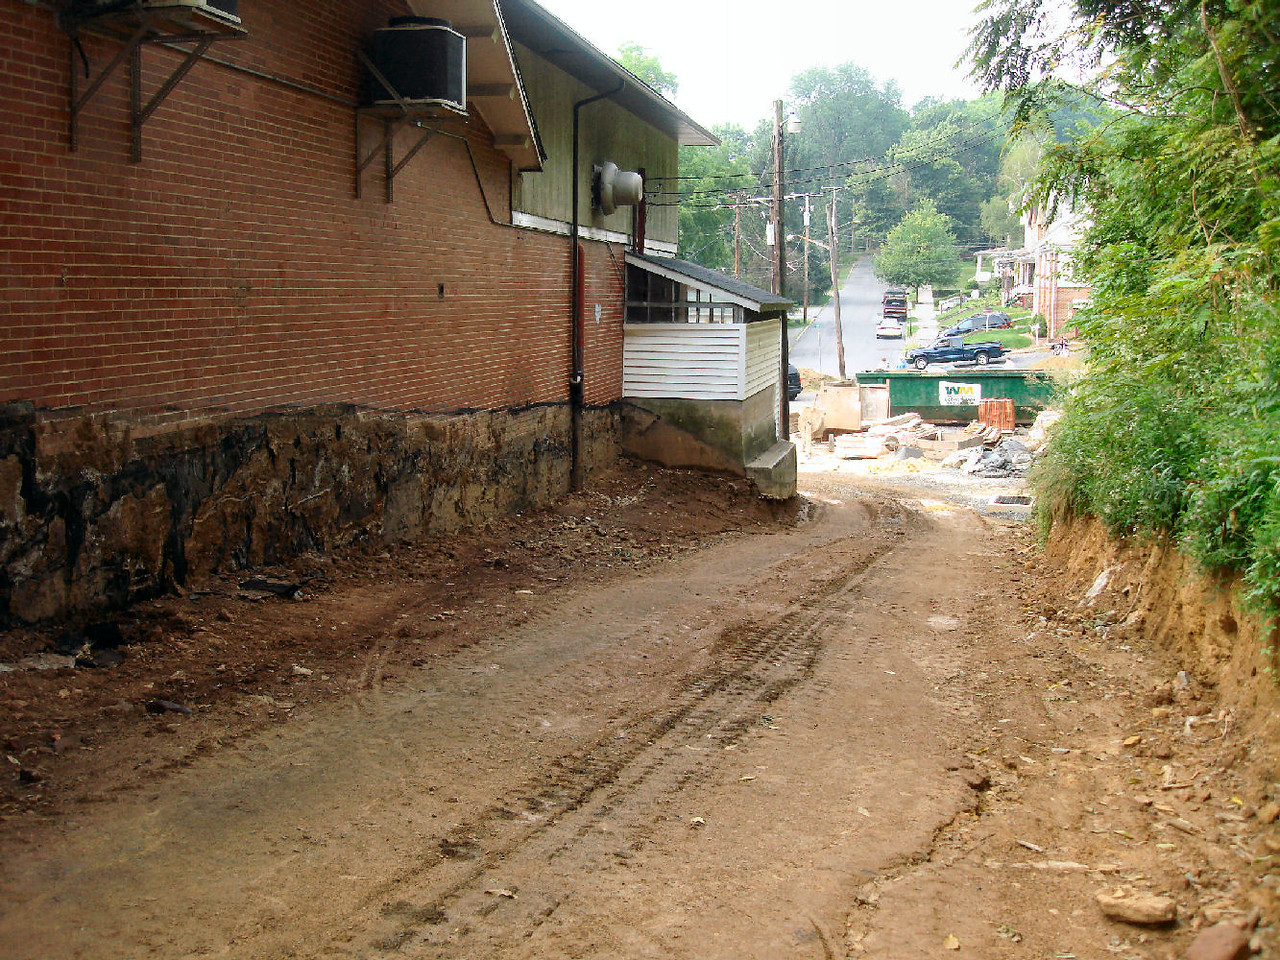 Saint Matthews Renovations 7-28-07 (4)